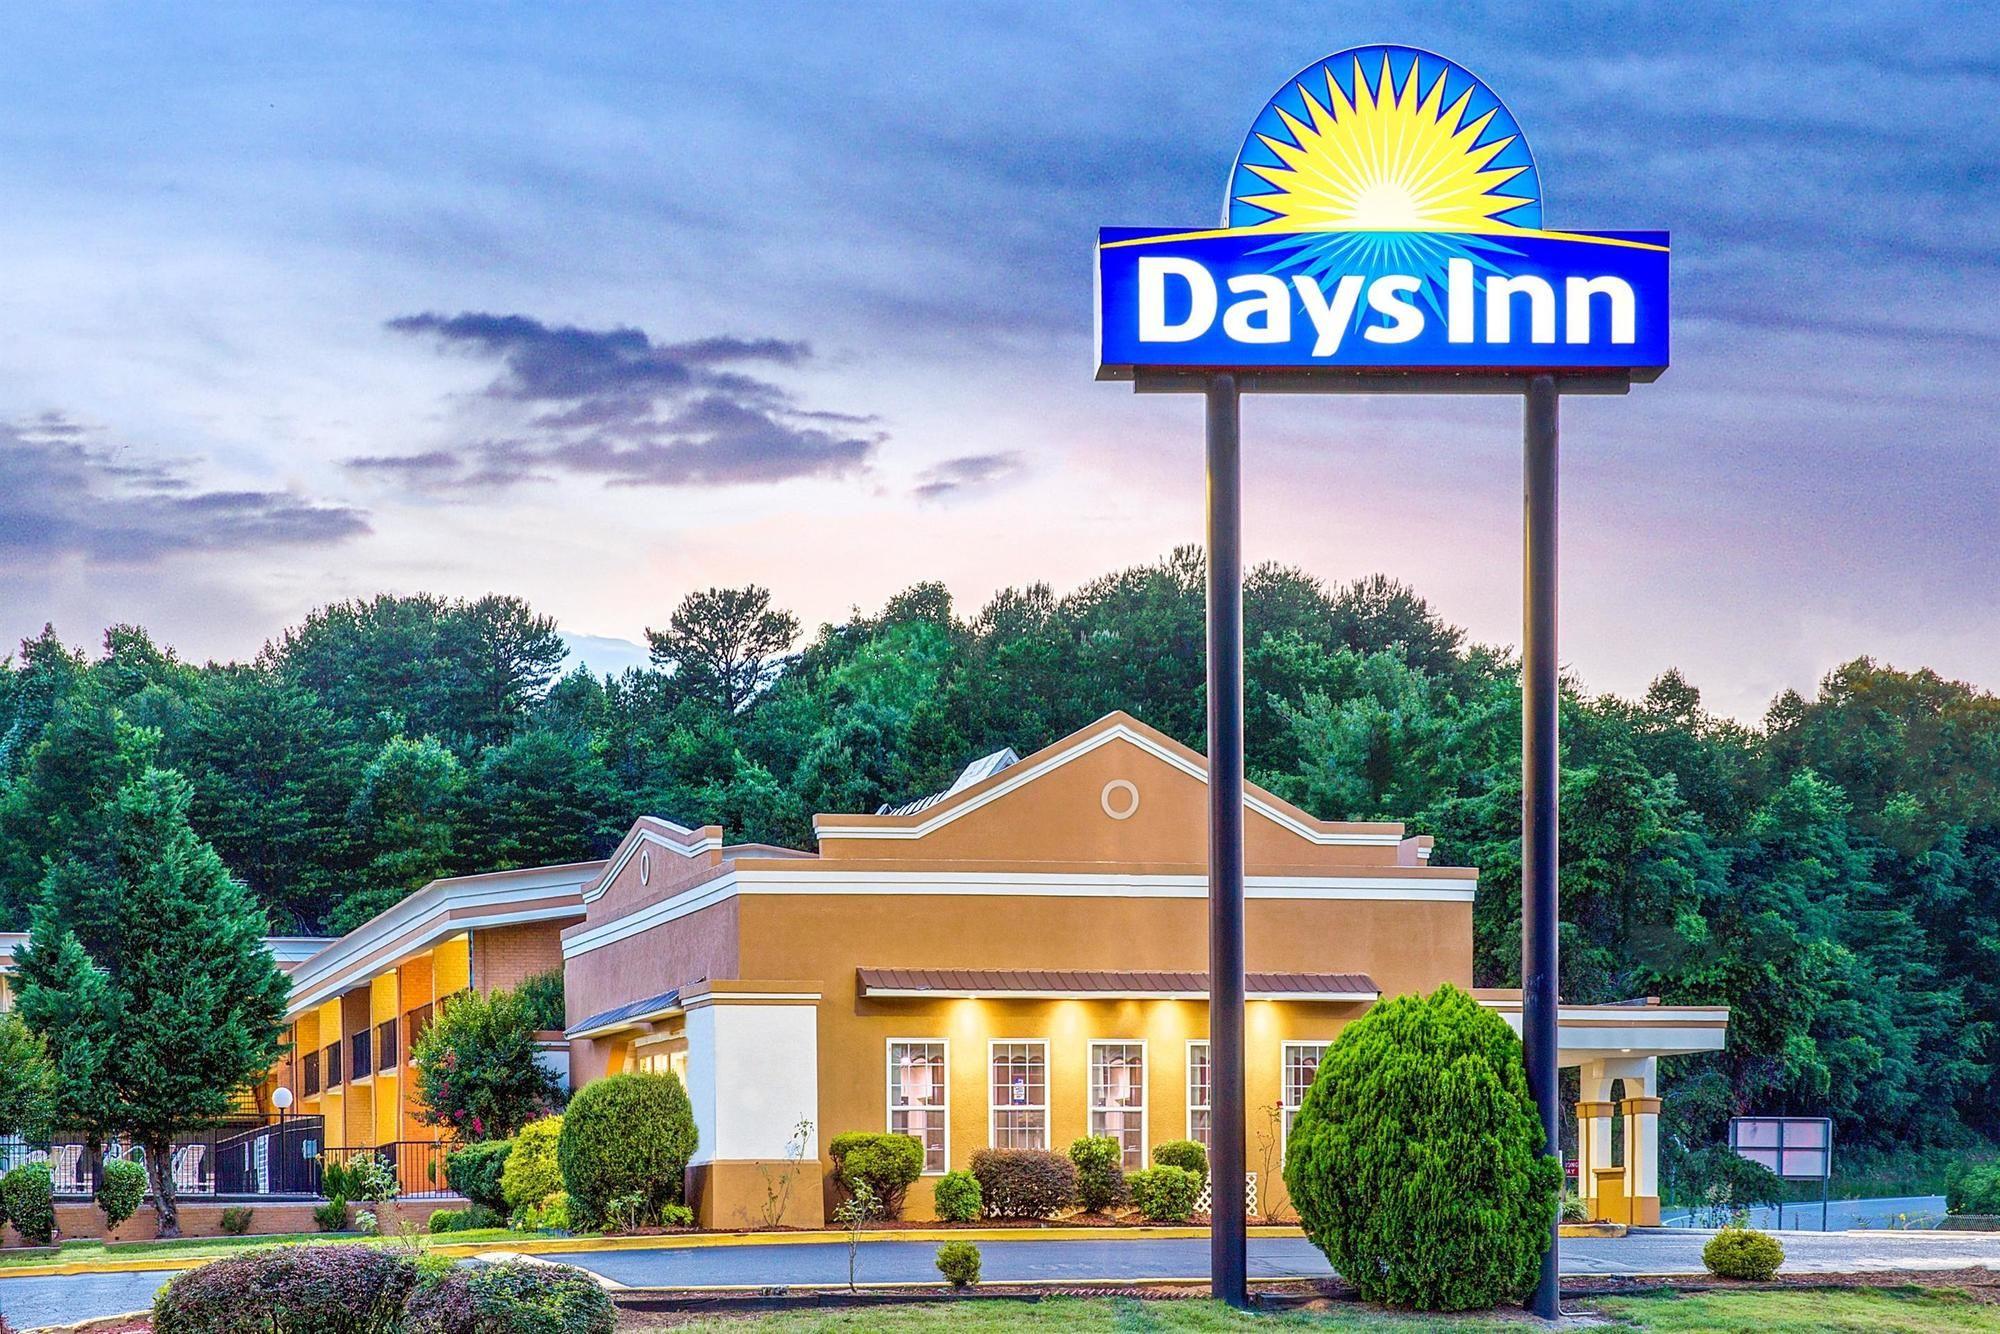 Days Inn Gastonia in Gastonia, NC